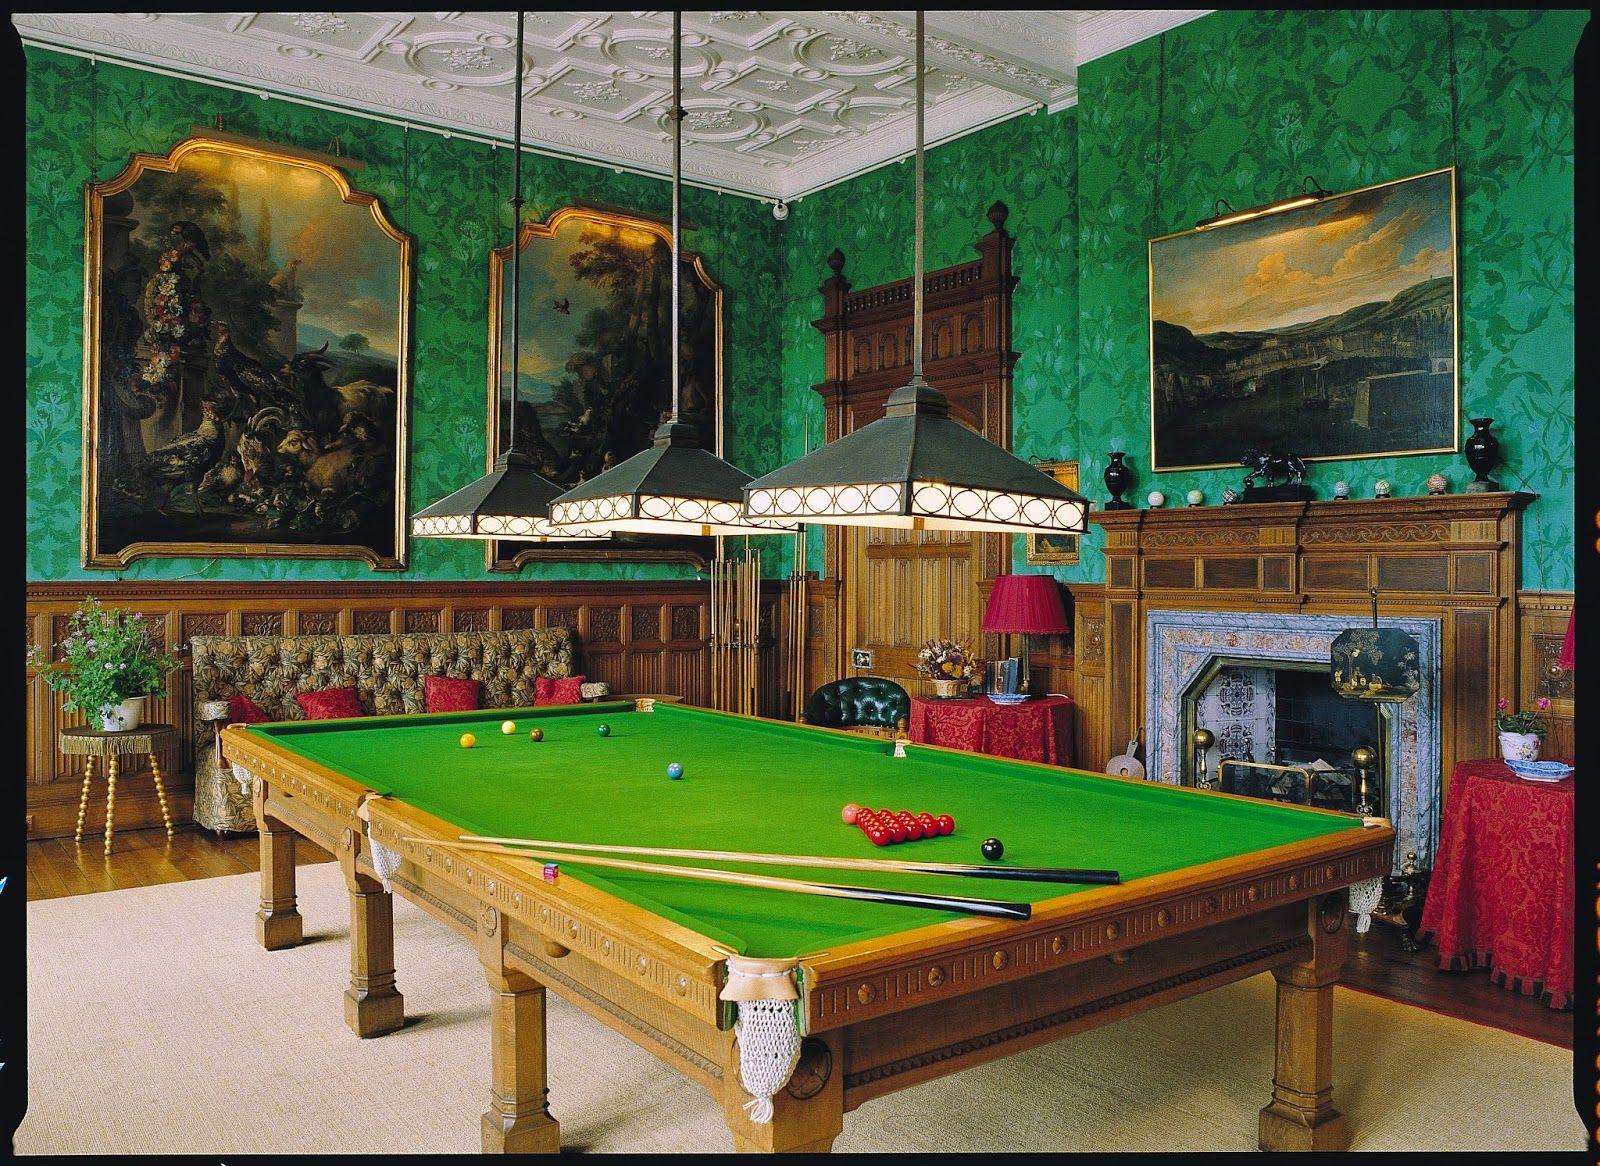 Holker Hall Billiard Room Billiard Room Snooker Room Billiards